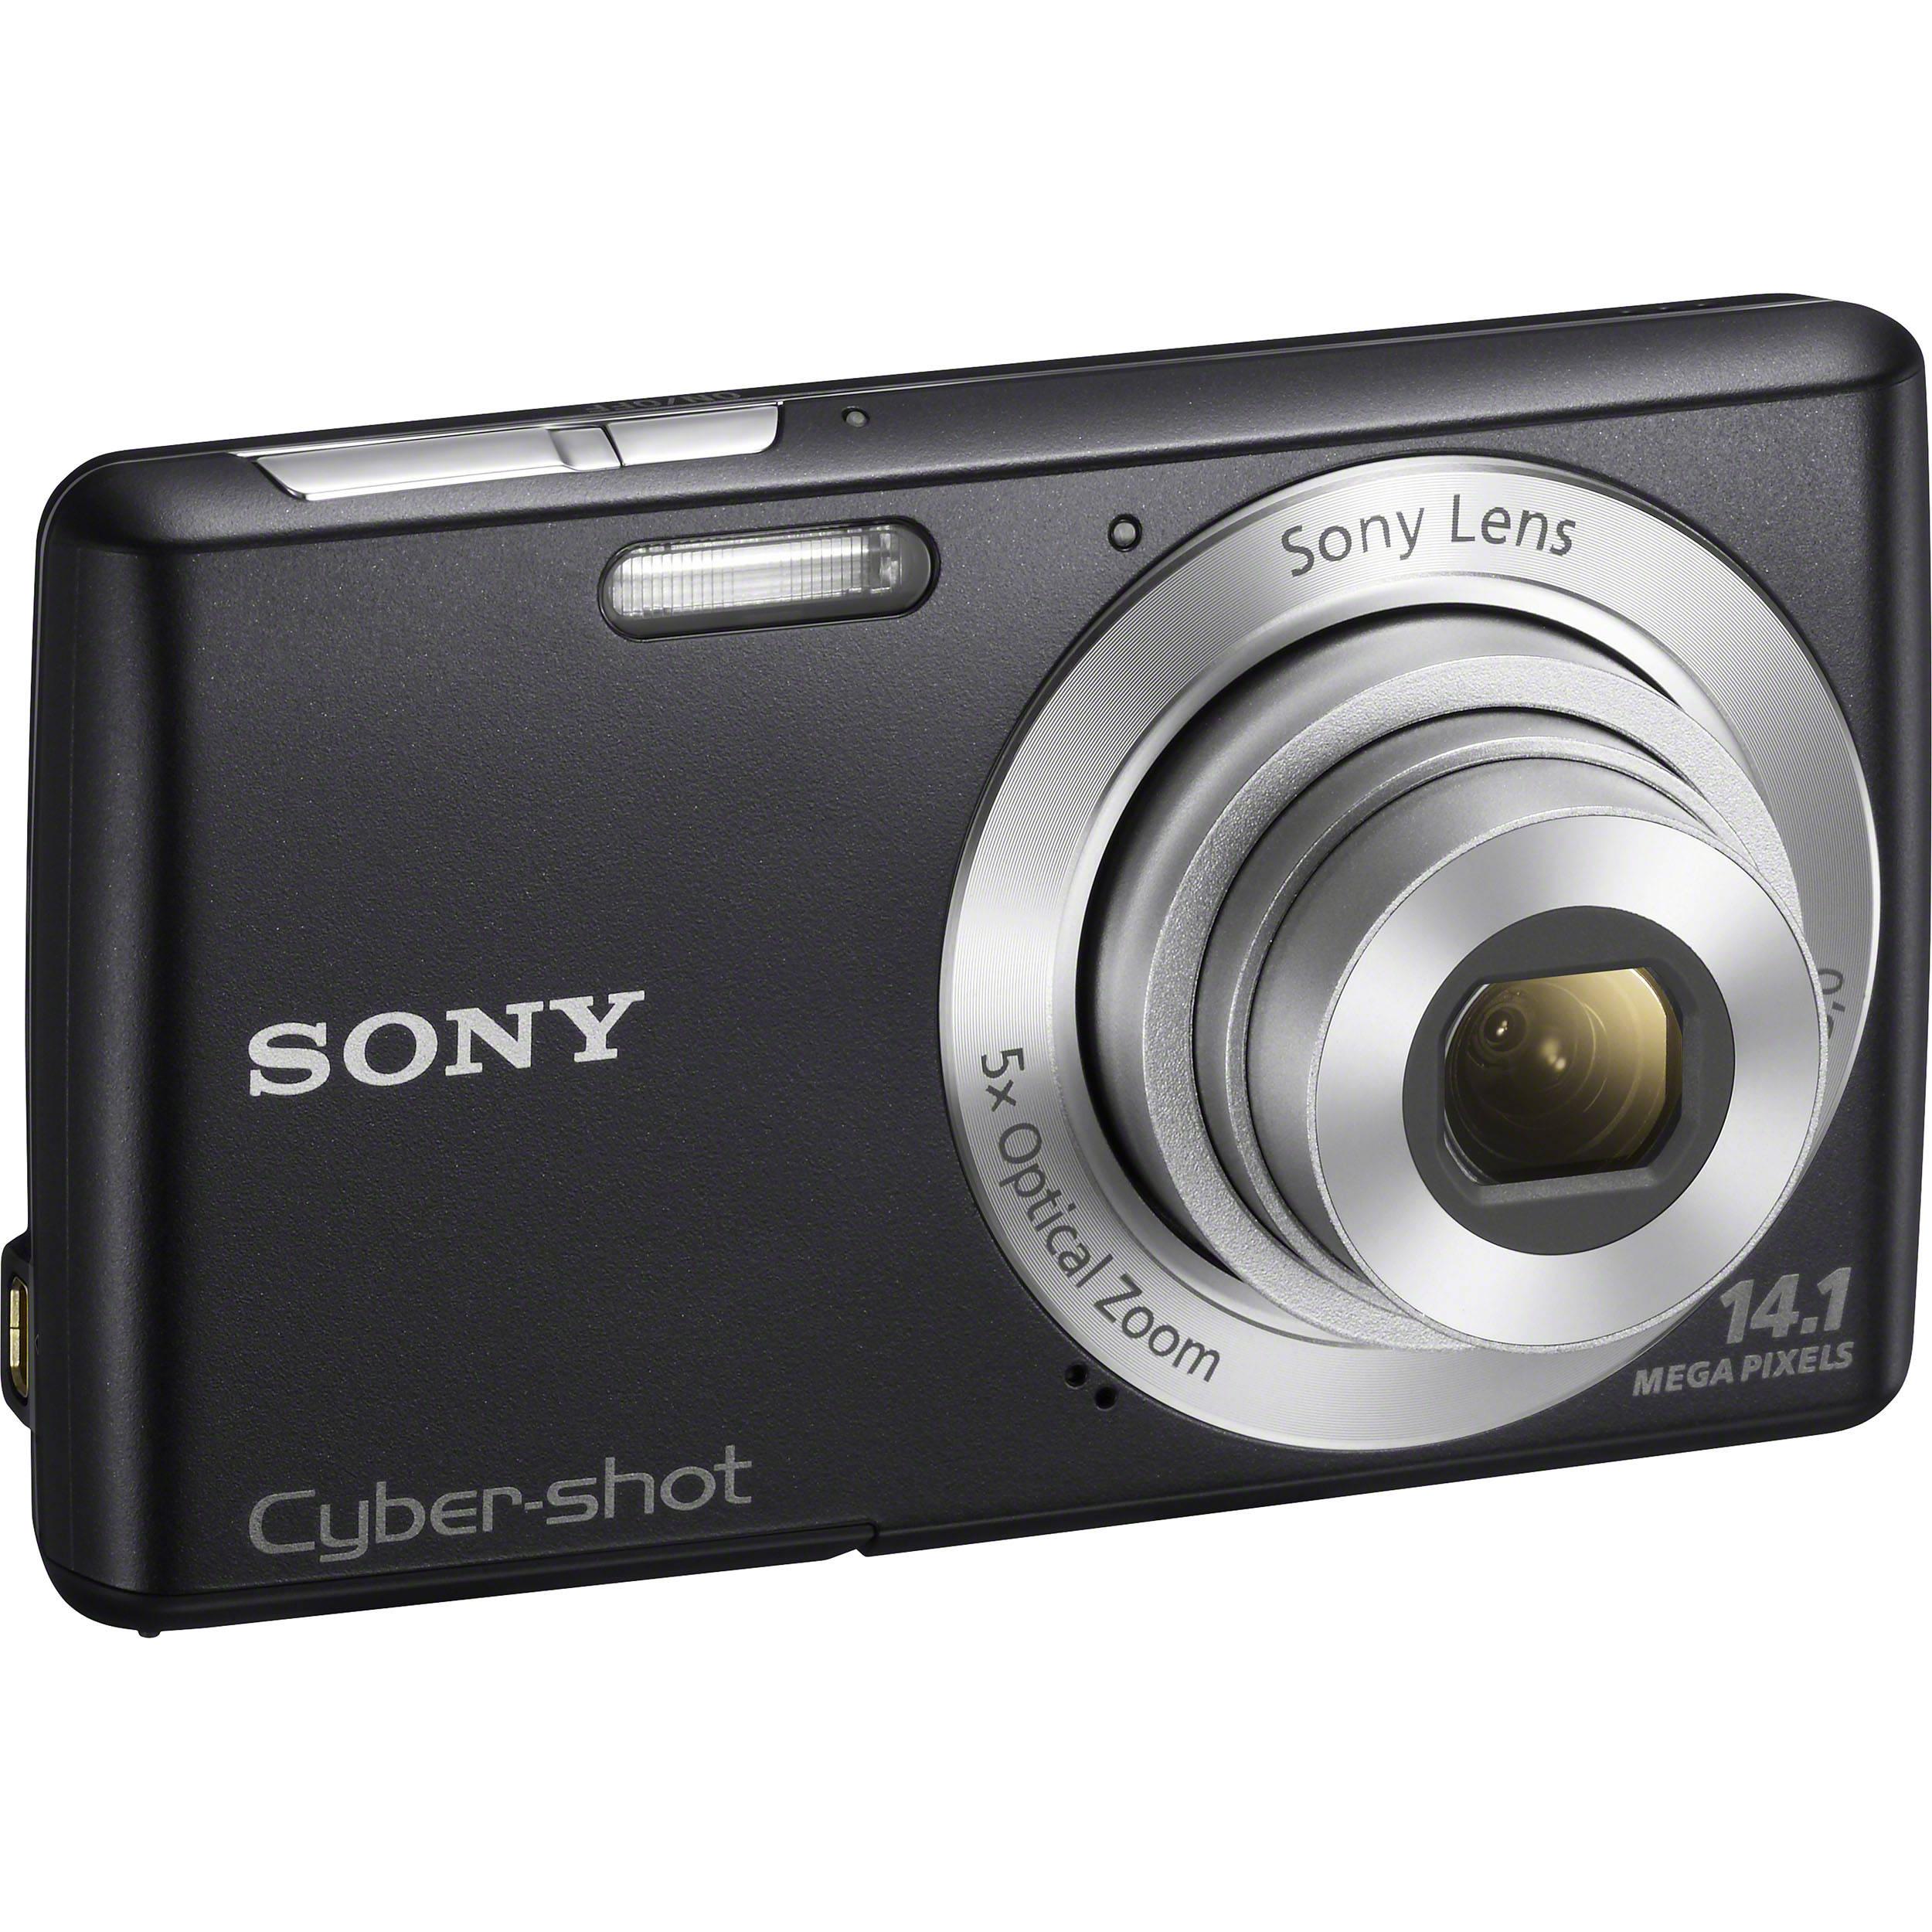 Usb kamera digital sony pilihan online terbaik.